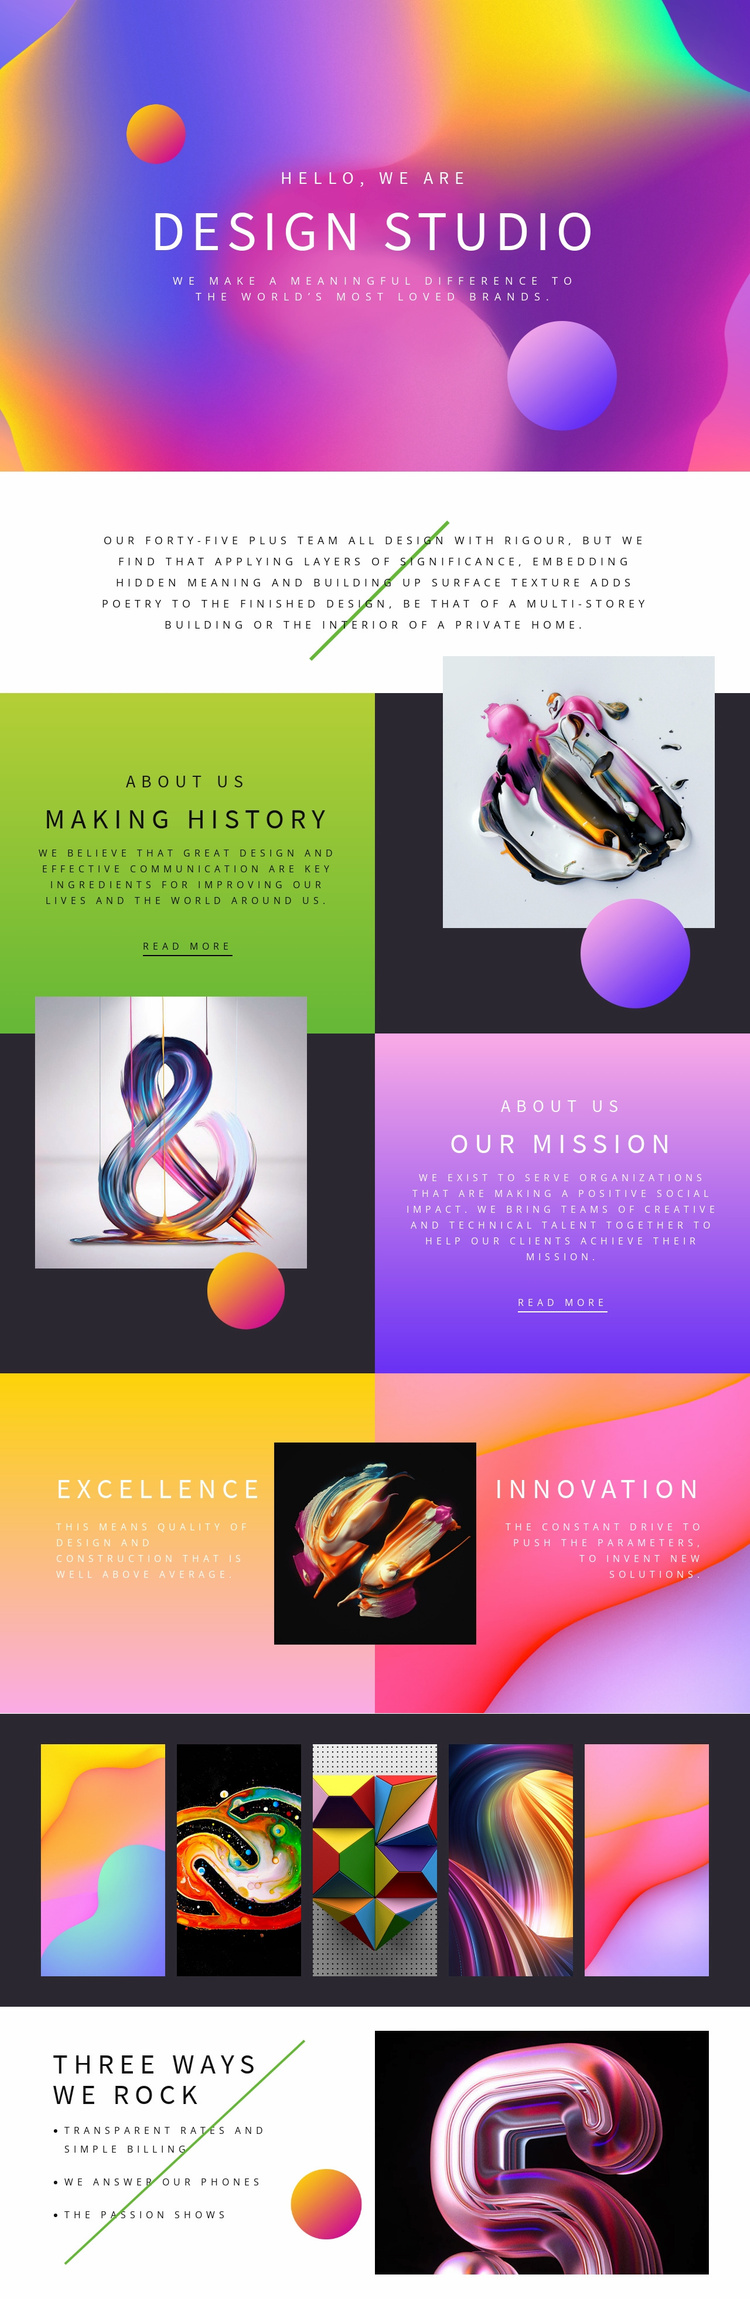 Progressive design art Website Template